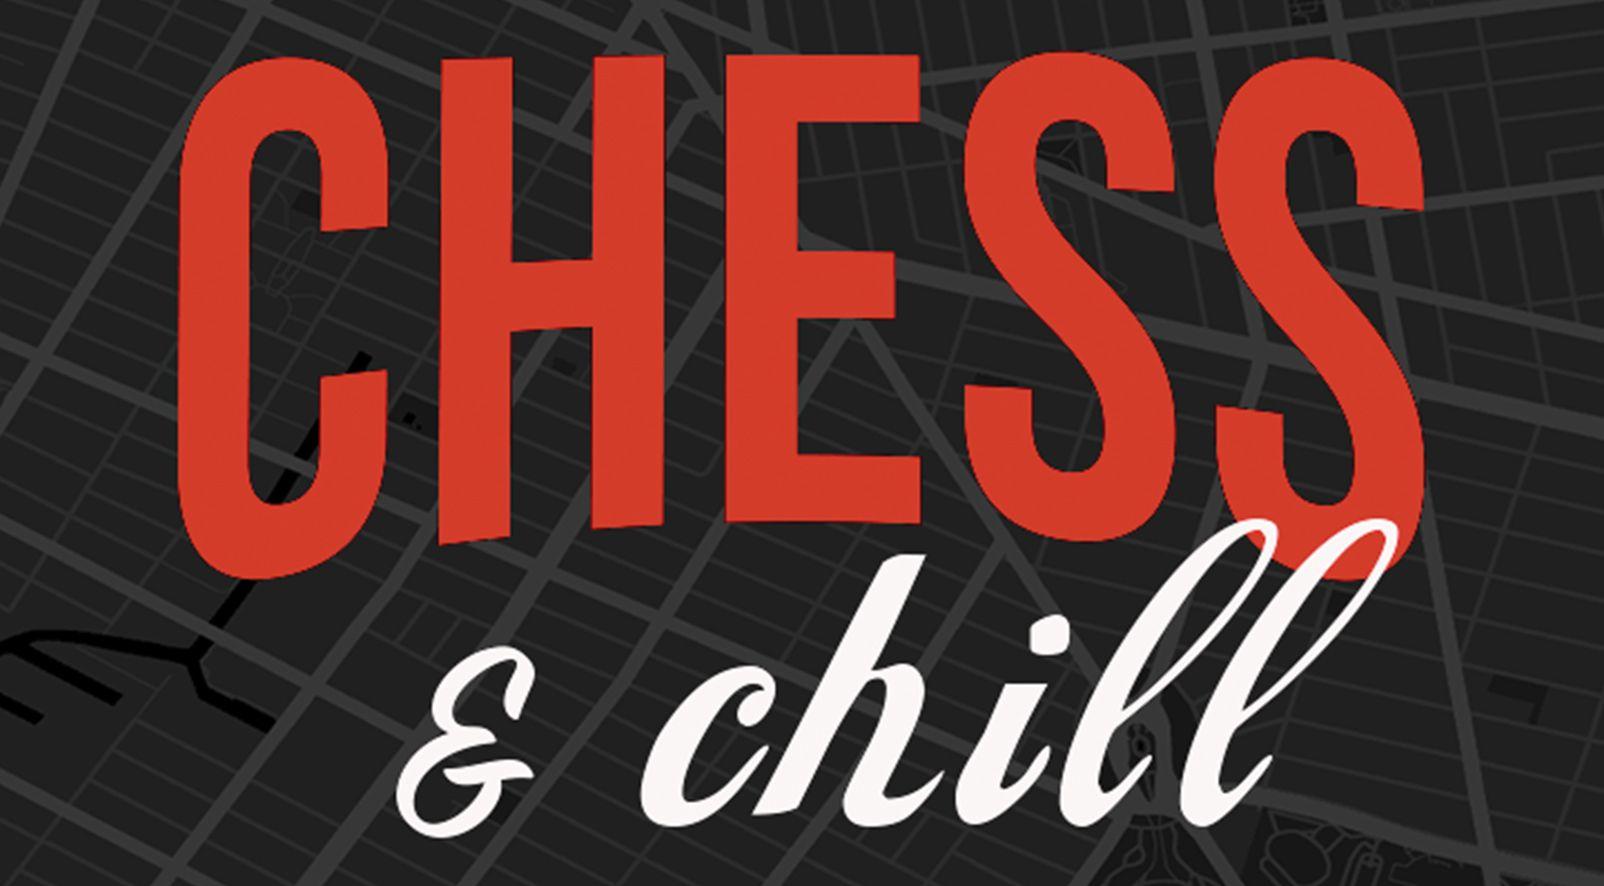 Chess & Chill